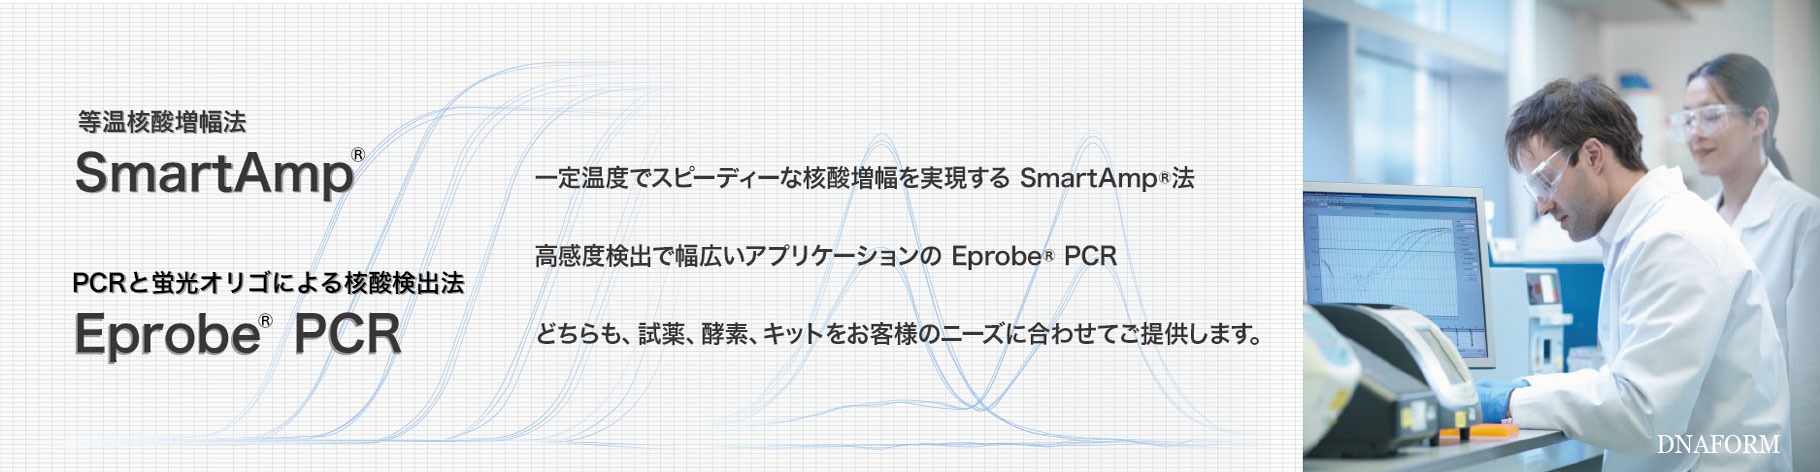 SmartAmp / Eprobe PCR